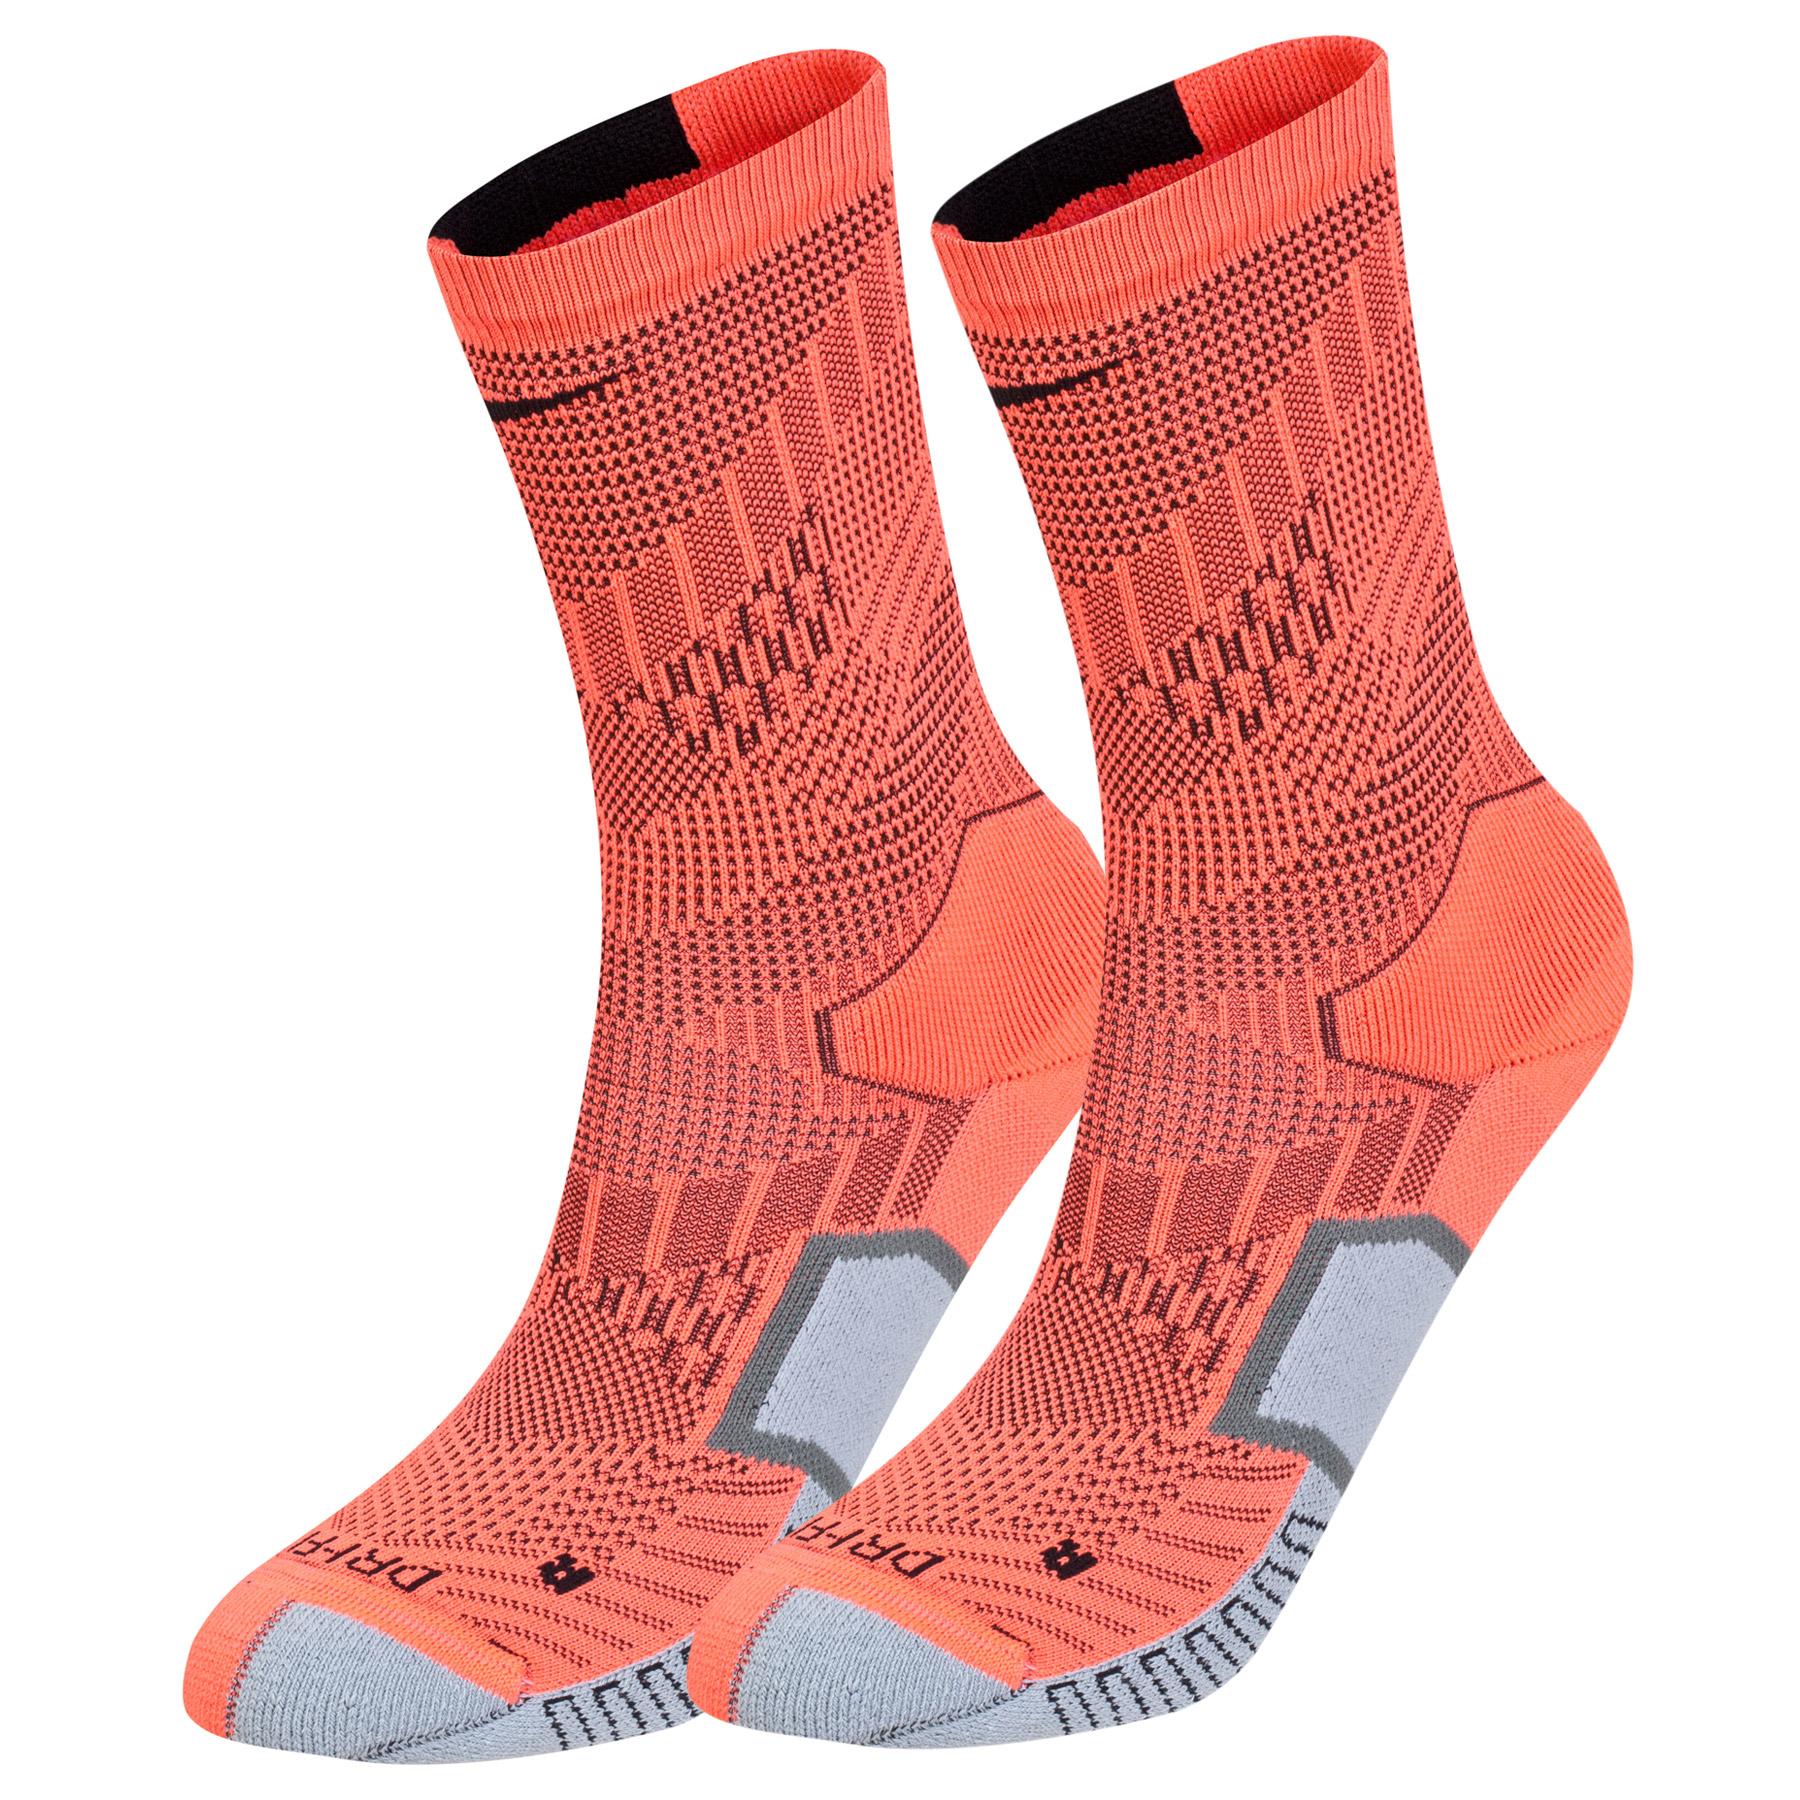 Nike Elite Match Fit Socks Red